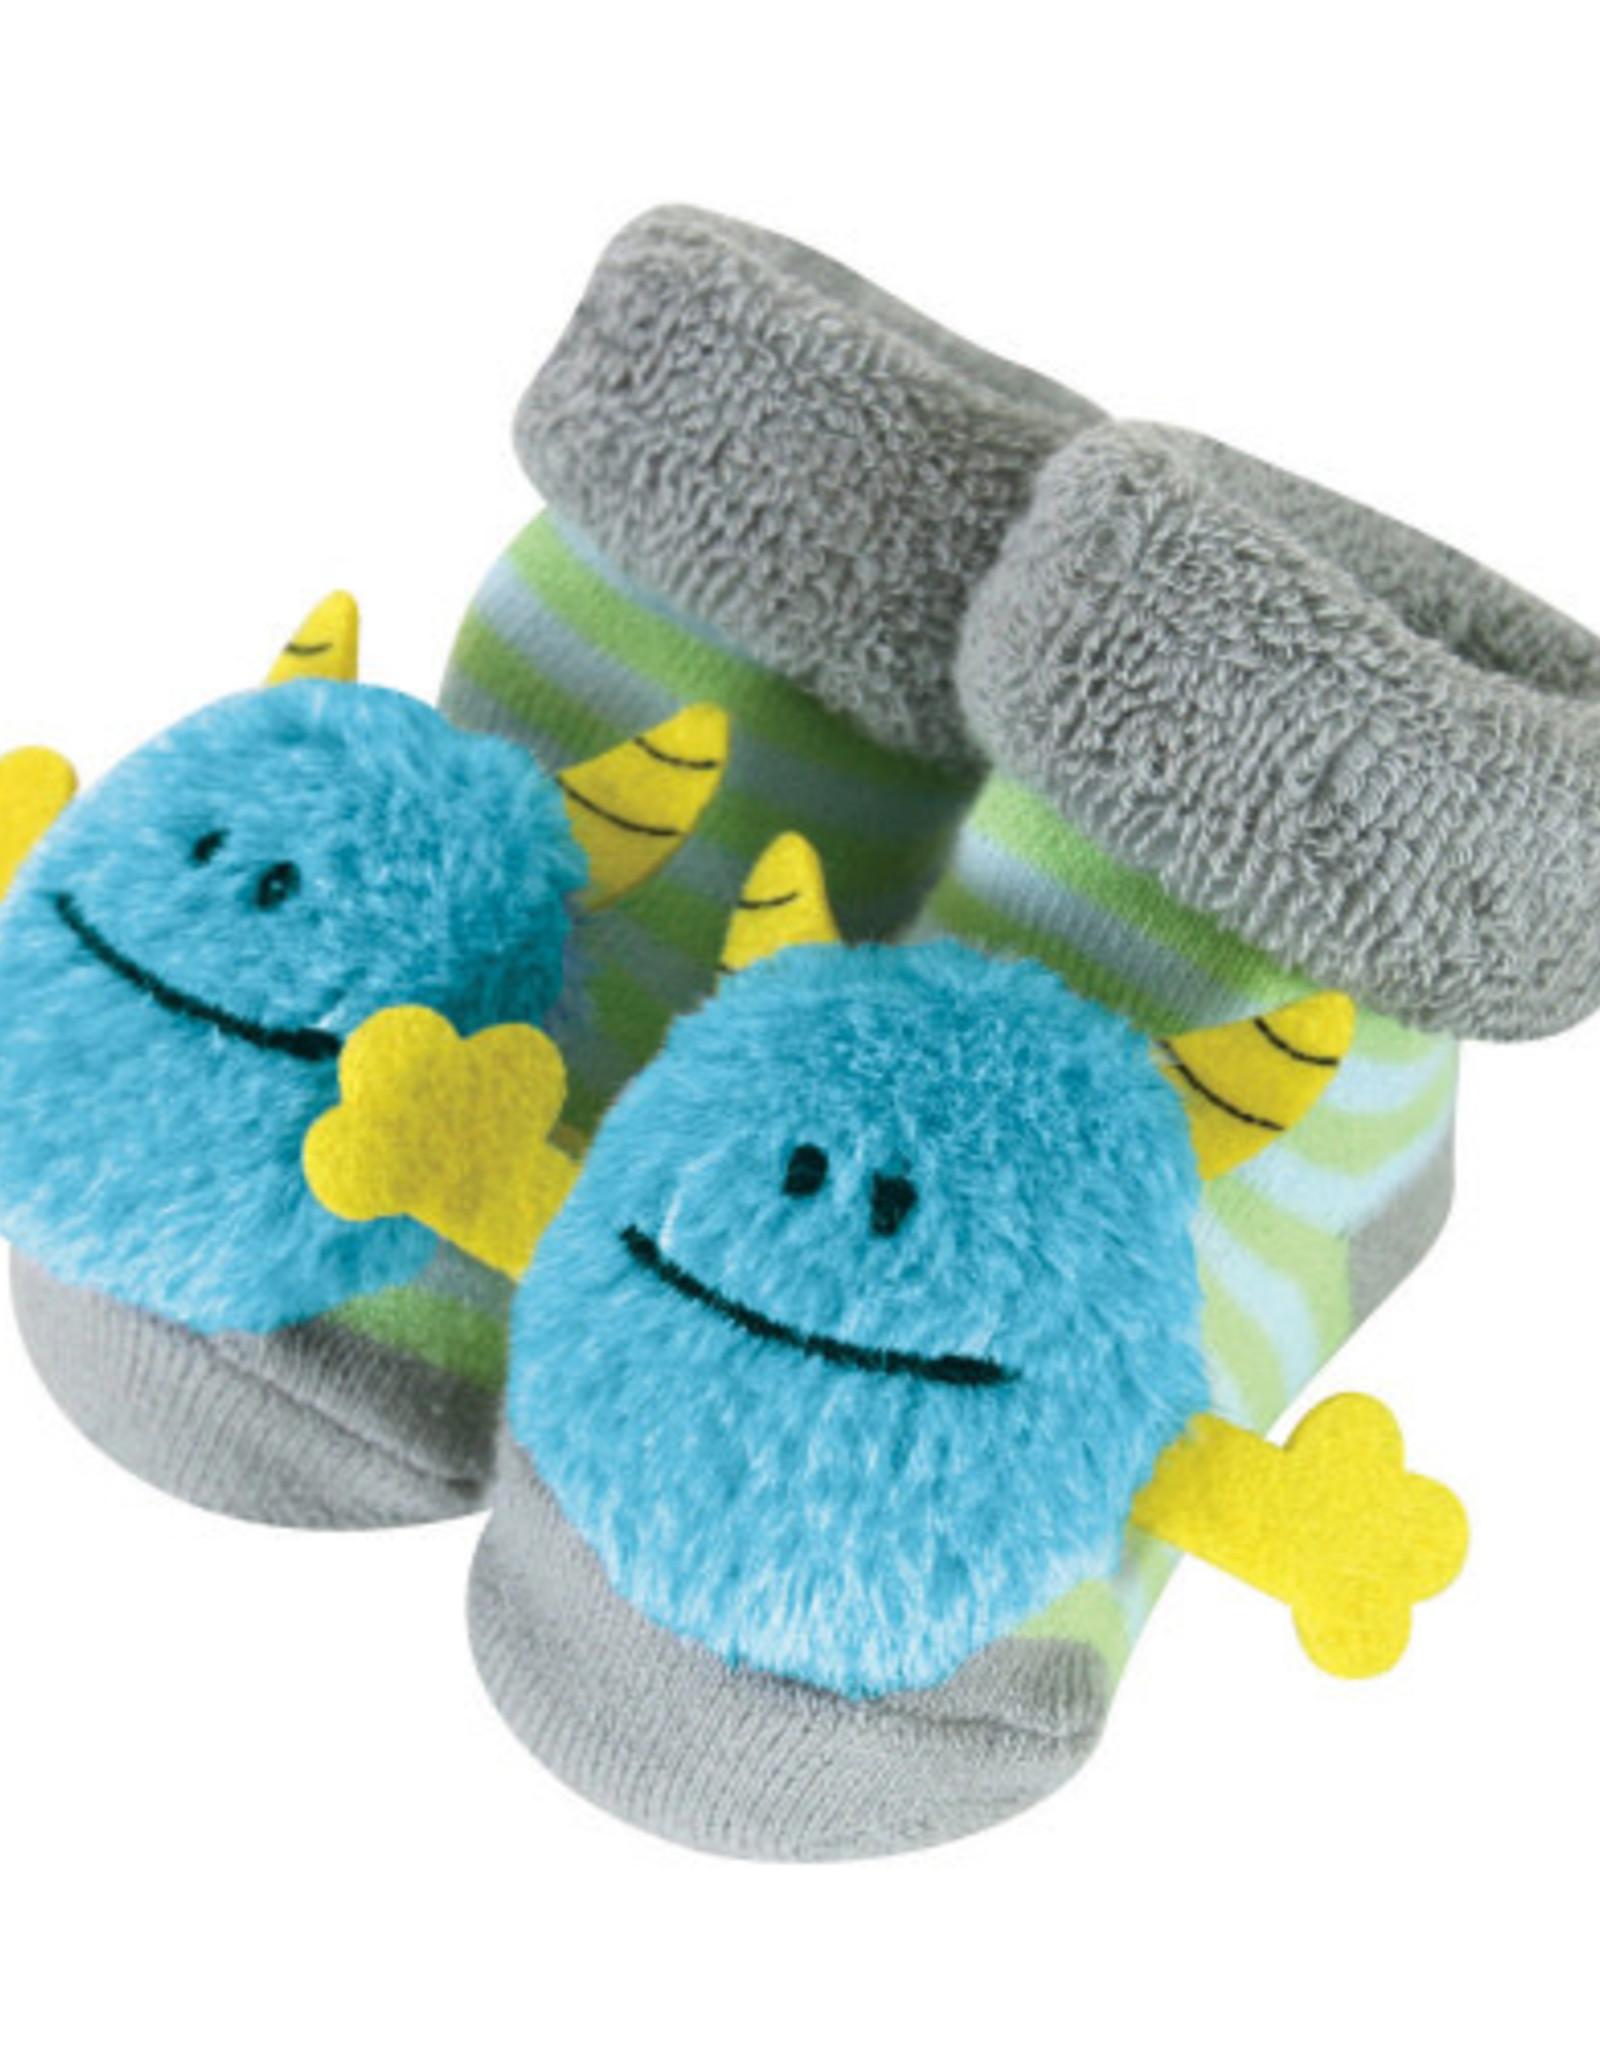 Creative Brands Baby Rattle Socks